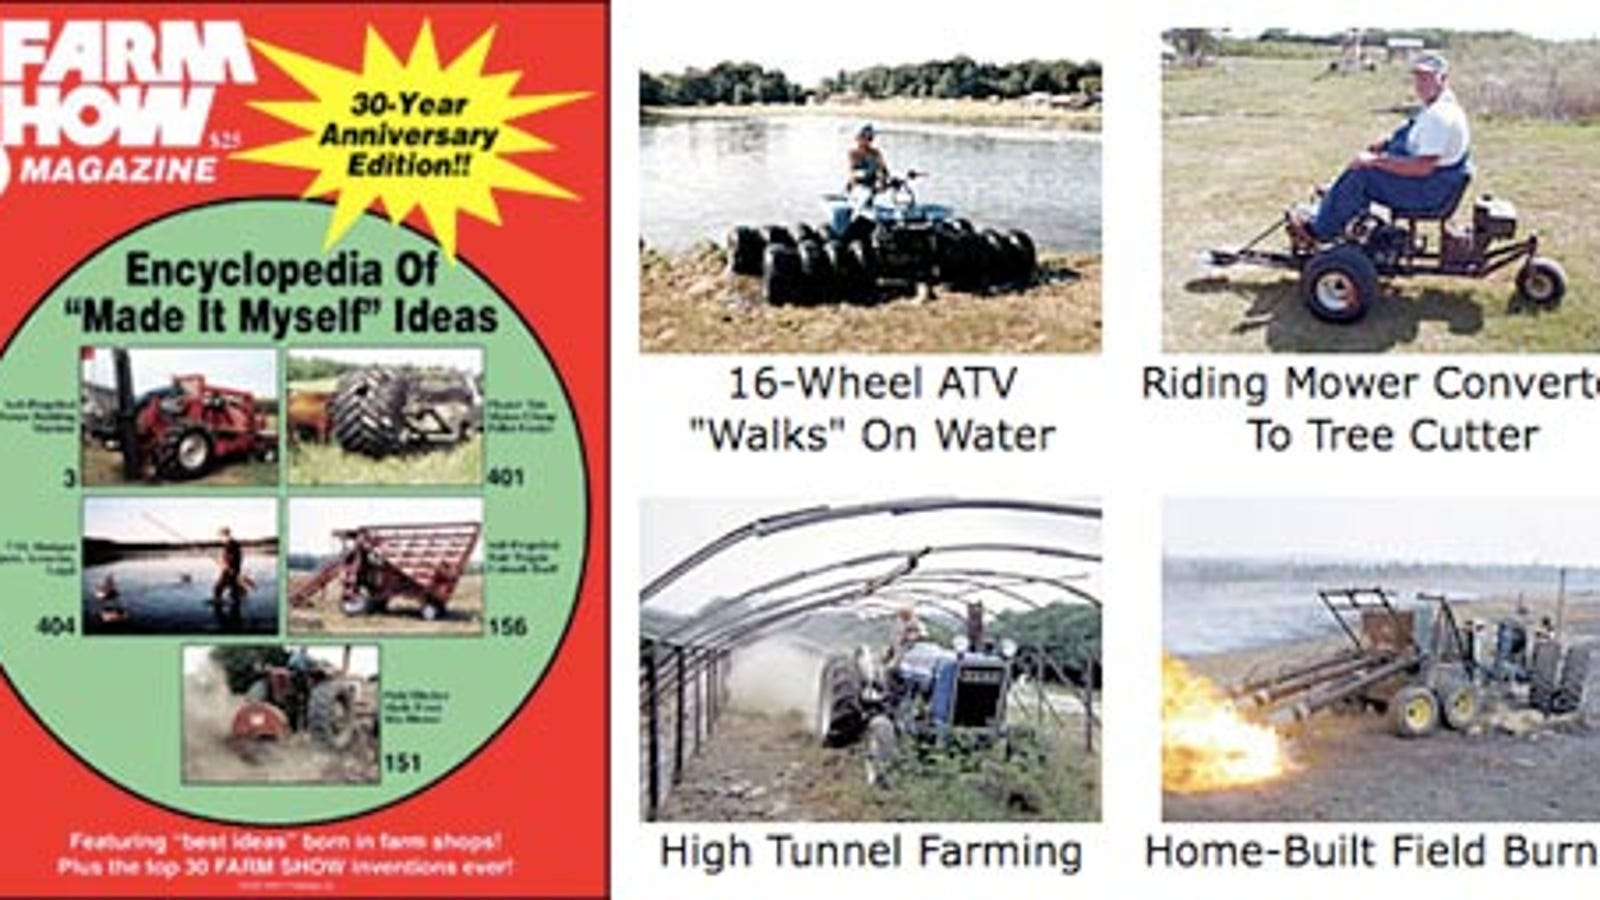 Farm Show Magazine Encyclopedia Chock Full of DIY Inspiration